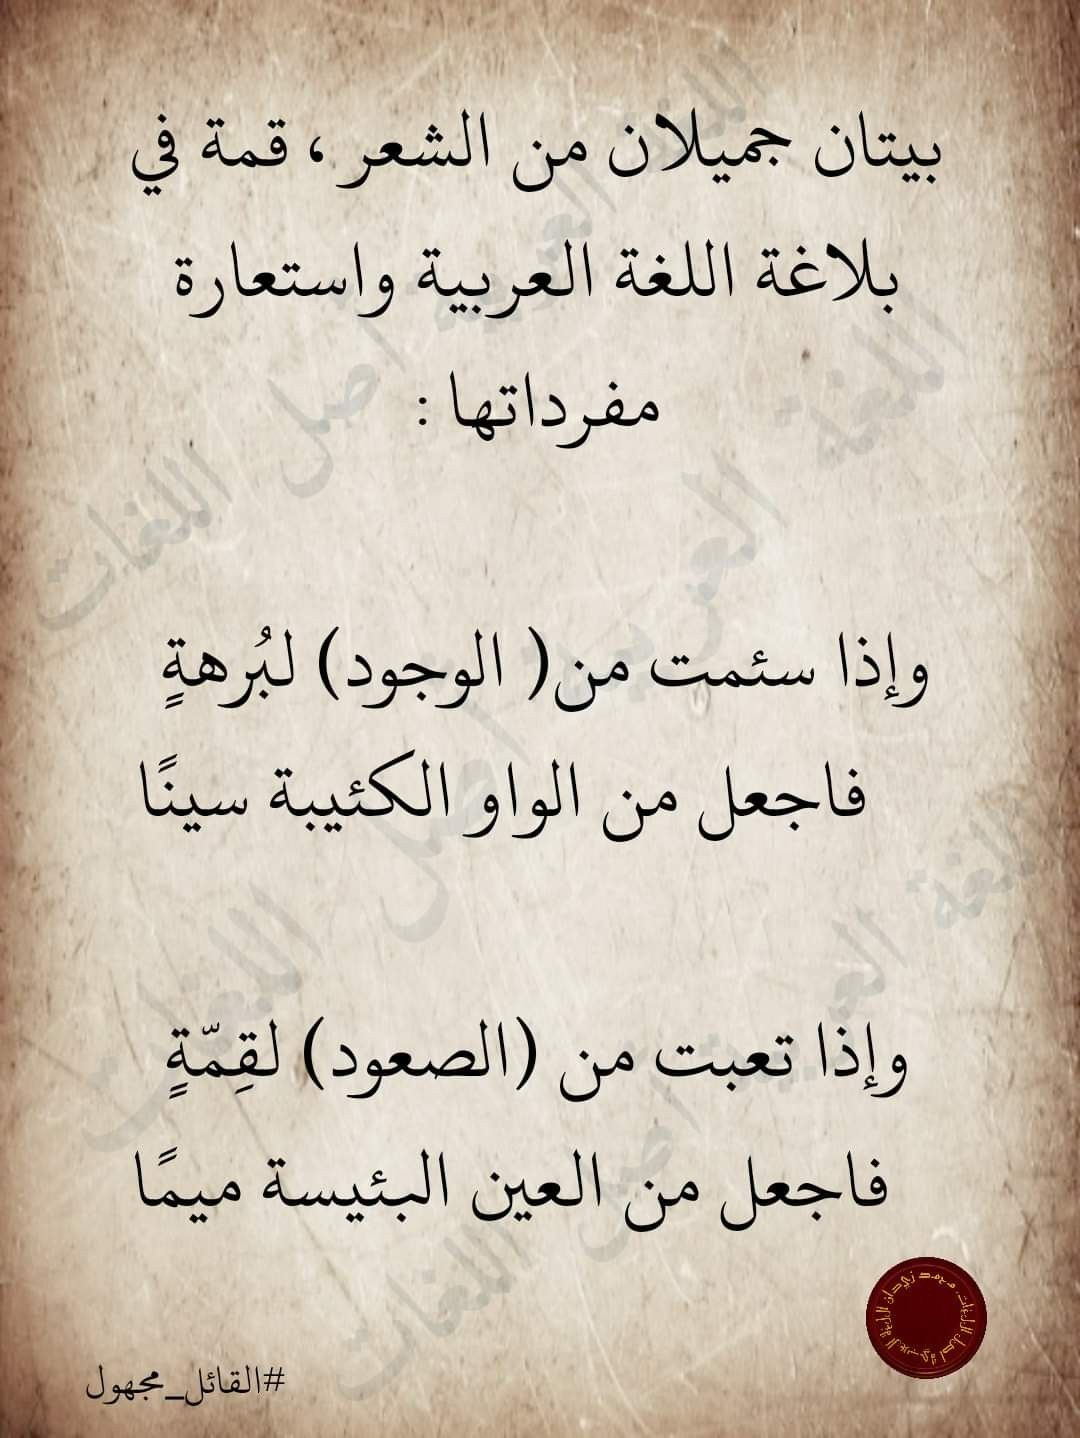 Pin By هبة الحياة On من روائع اللغة العربية Islamic Love Quotes Language Quotes Favorite Book Quotes